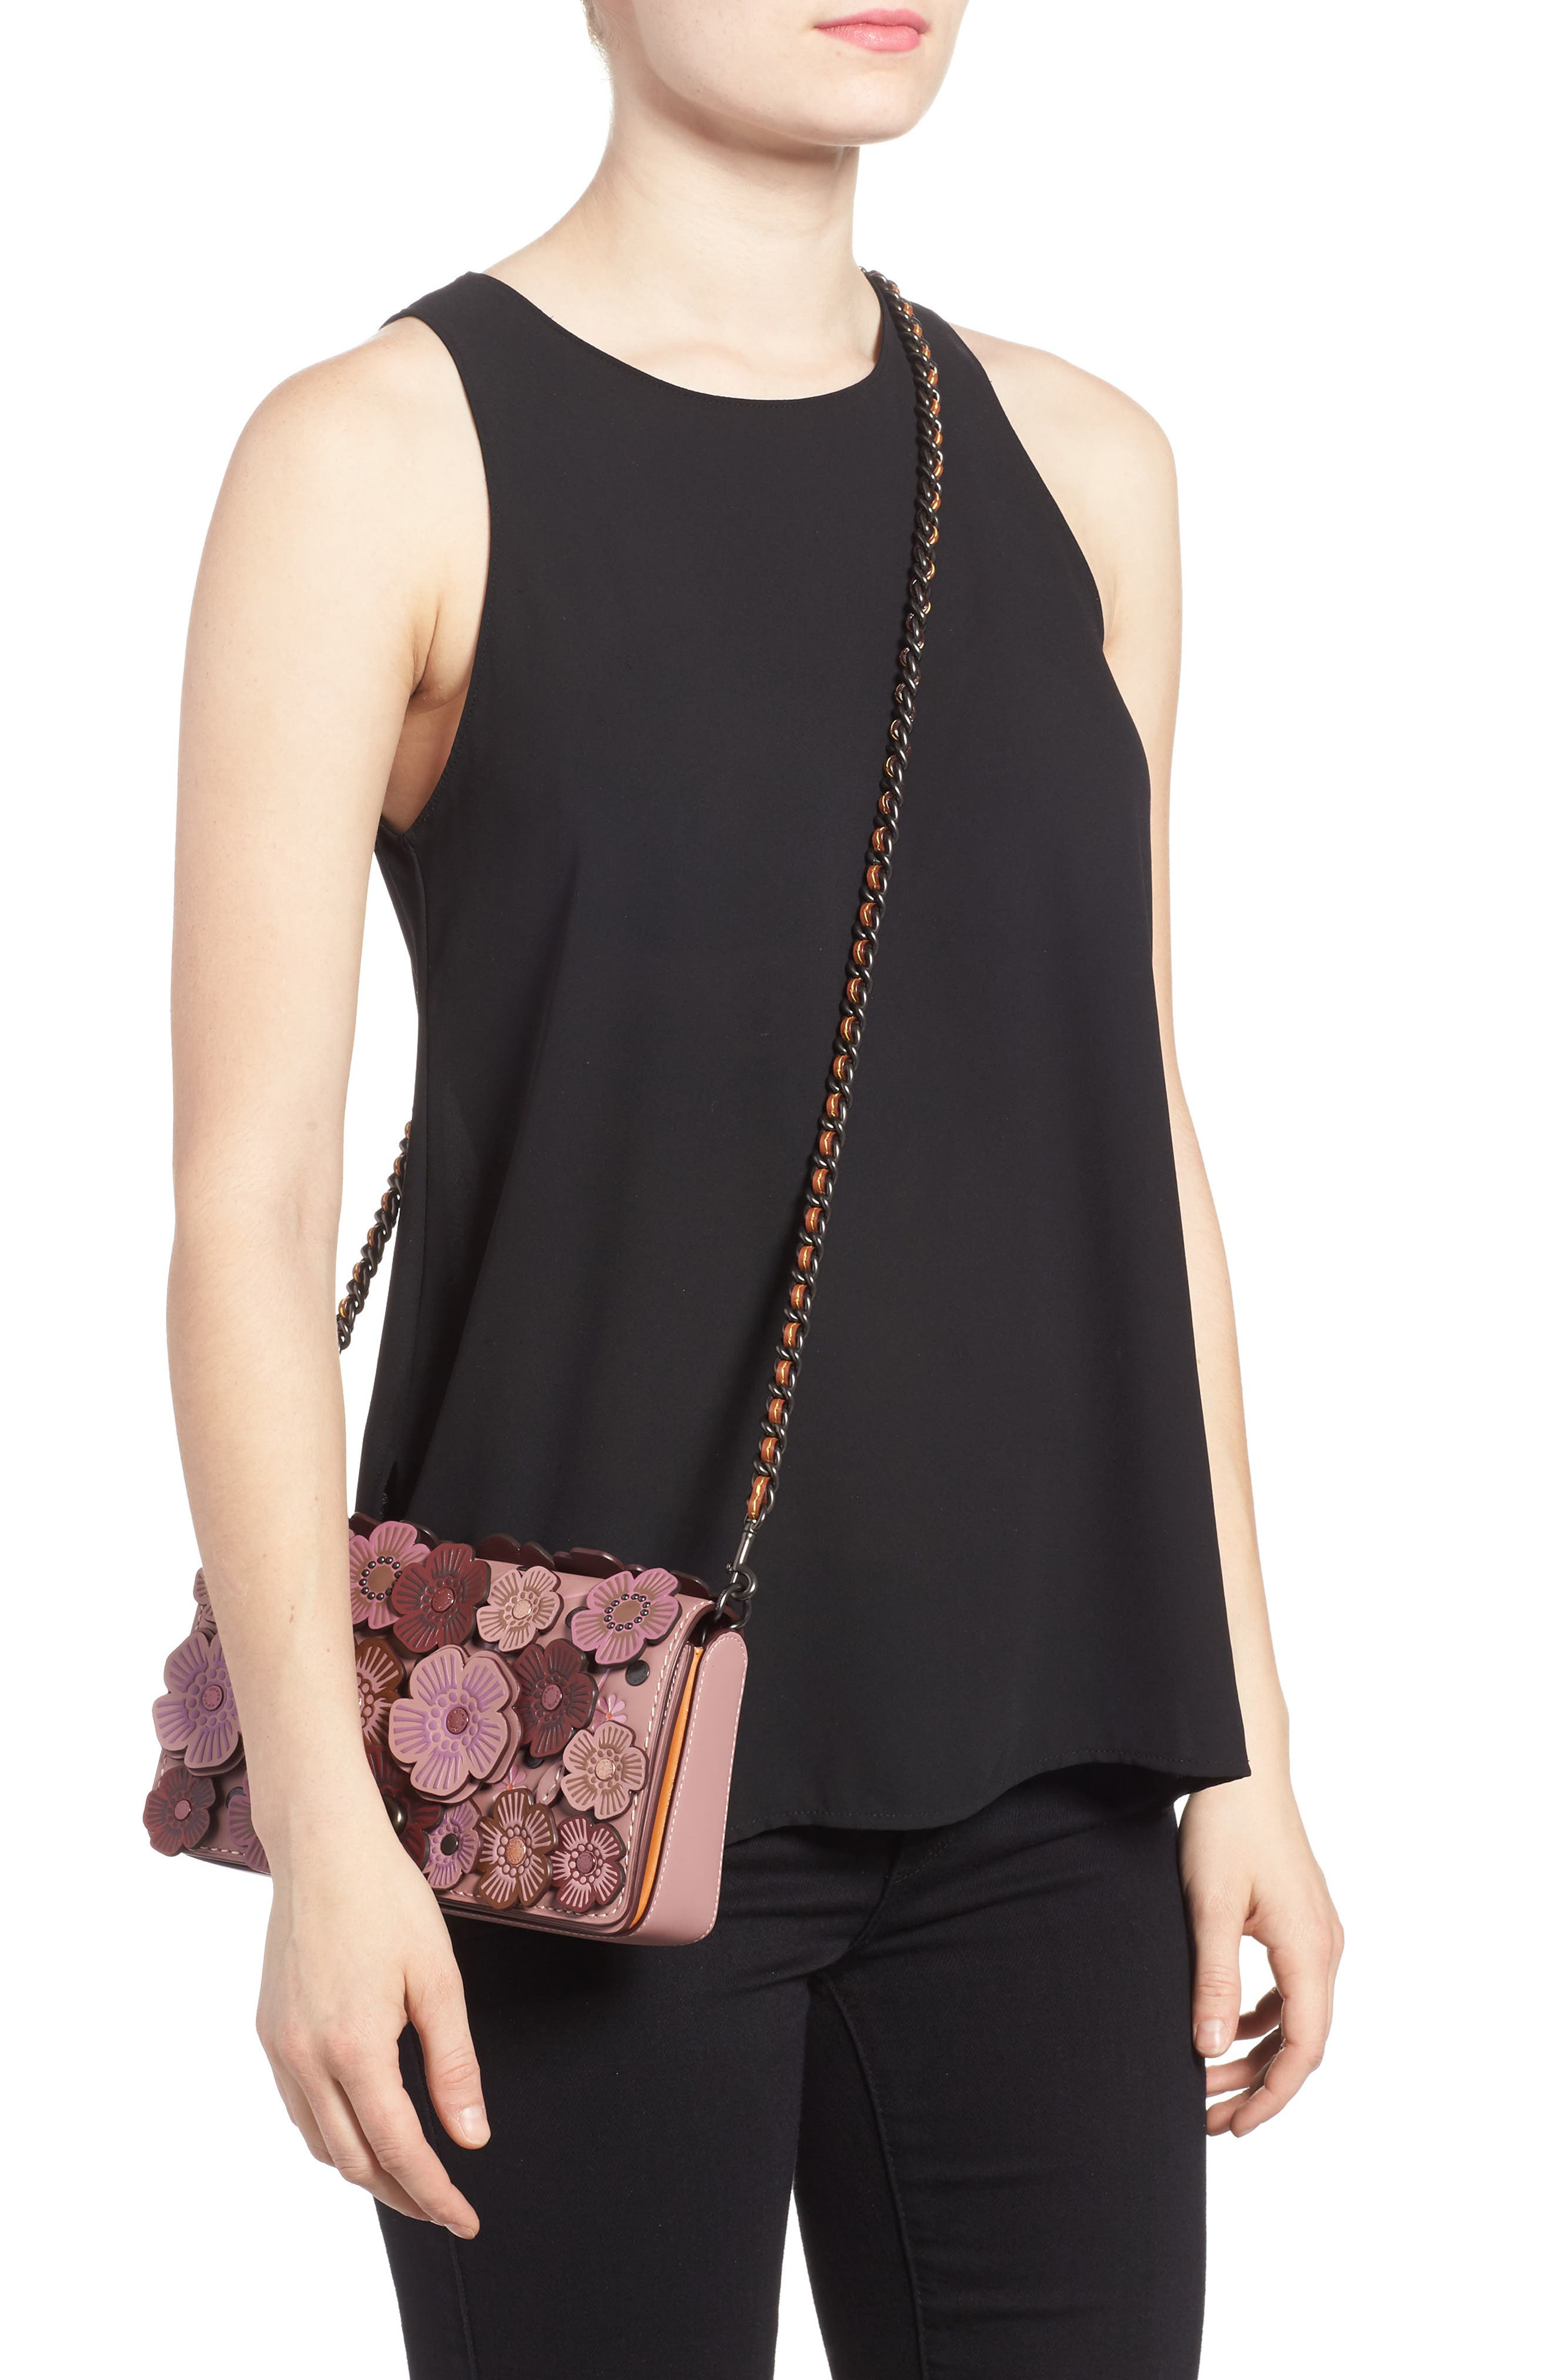 'Dinky' Flower Appliqué Leather Crossbody Bag,                             Alternate thumbnail 15, color,